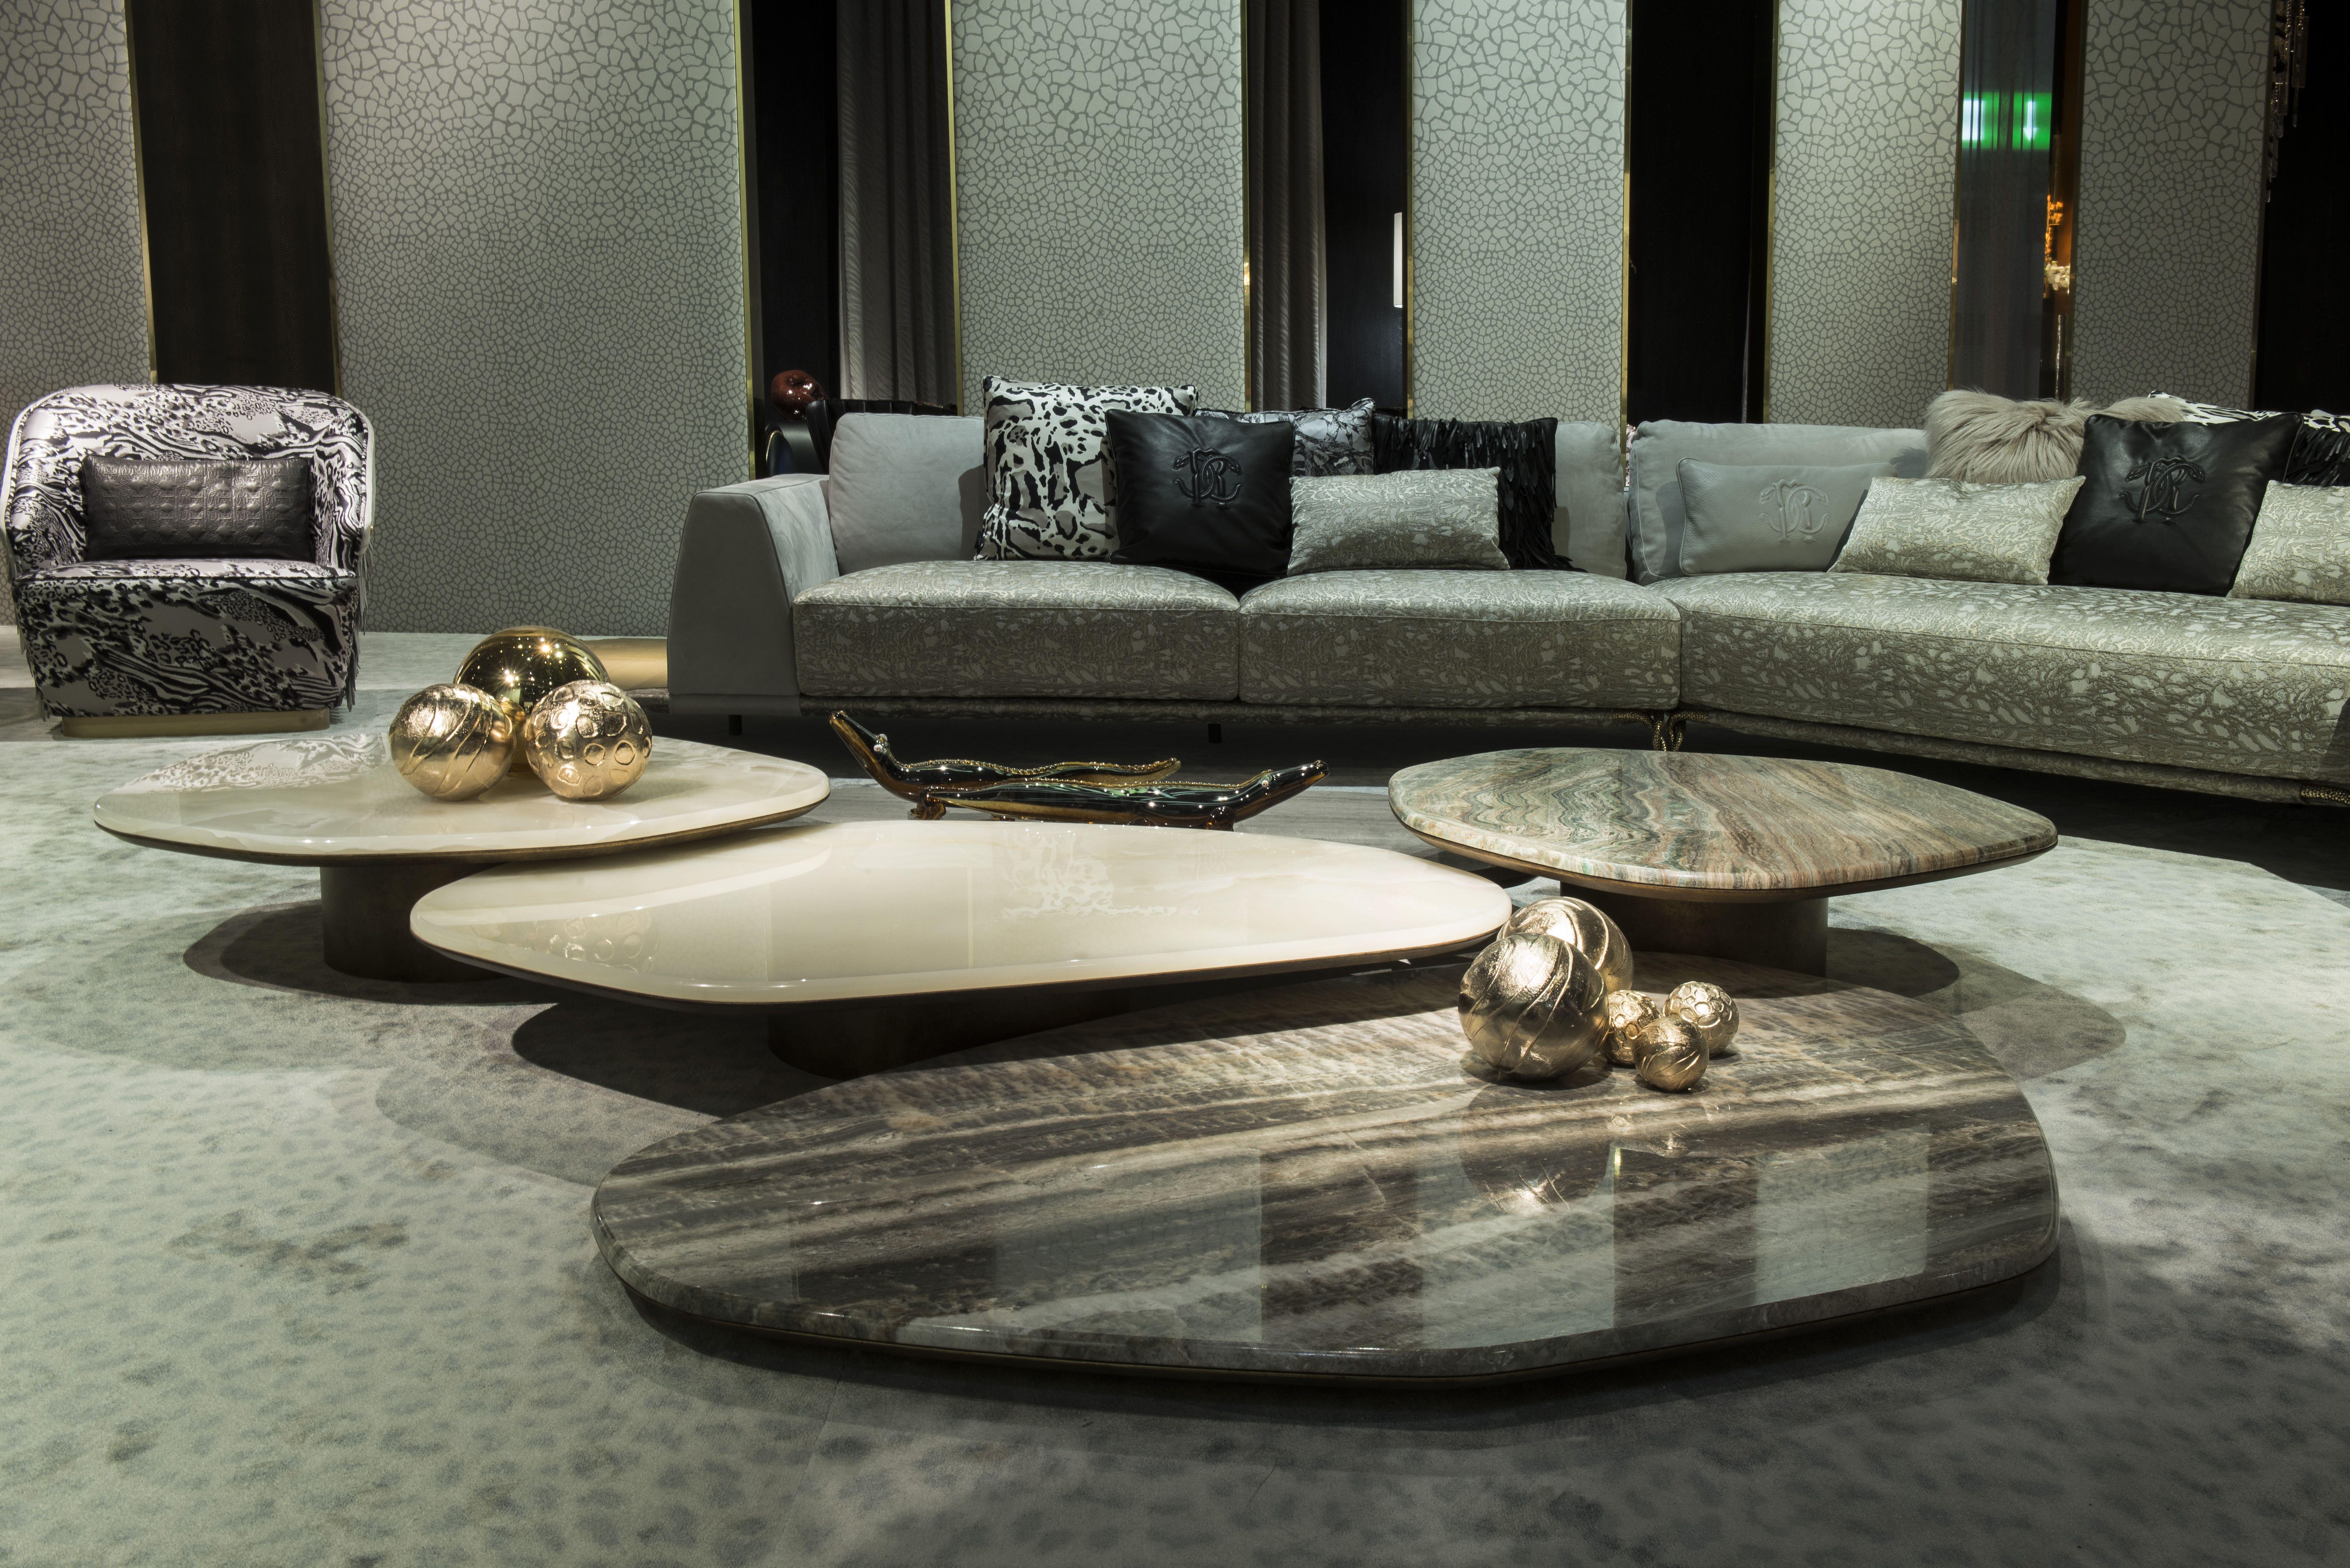 The Roberto Cavalli Turkana Table 2019 Coffee Table Luxury Coffee Table Interior Design [ 4912 x 7360 Pixel ]